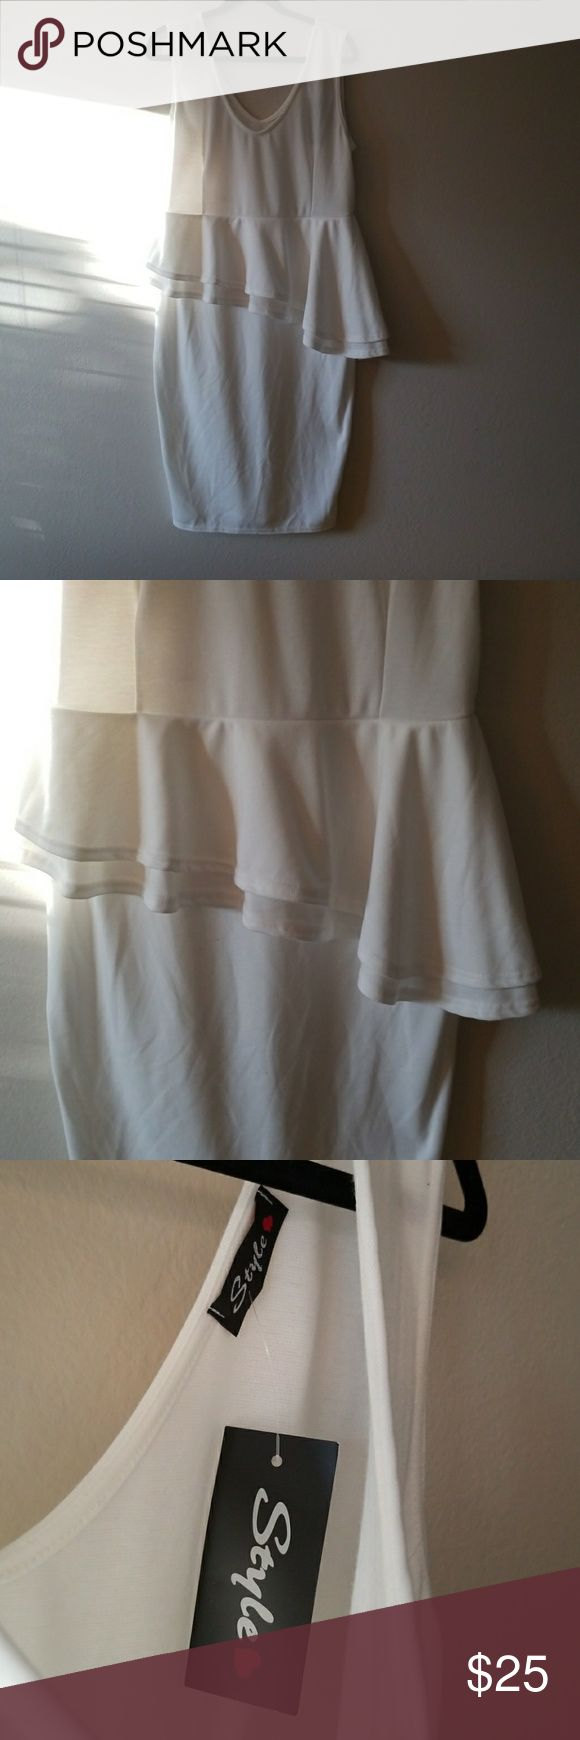 NWT White Peplum Dress Brand new! Style Dresses Midi